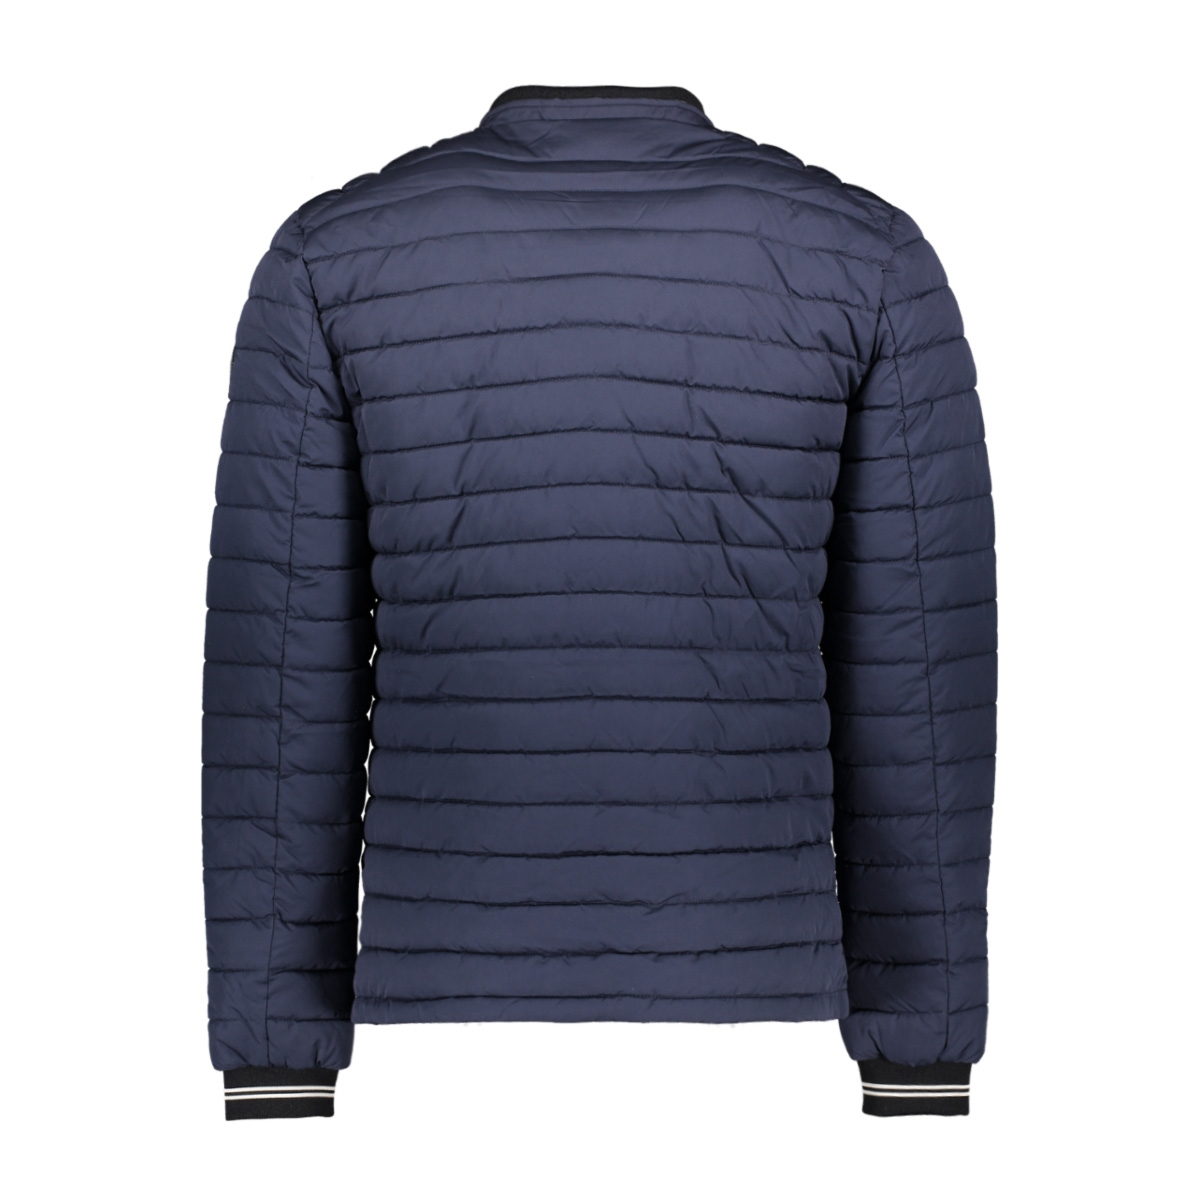 jacket 97630702sn no-excess jas 078 night